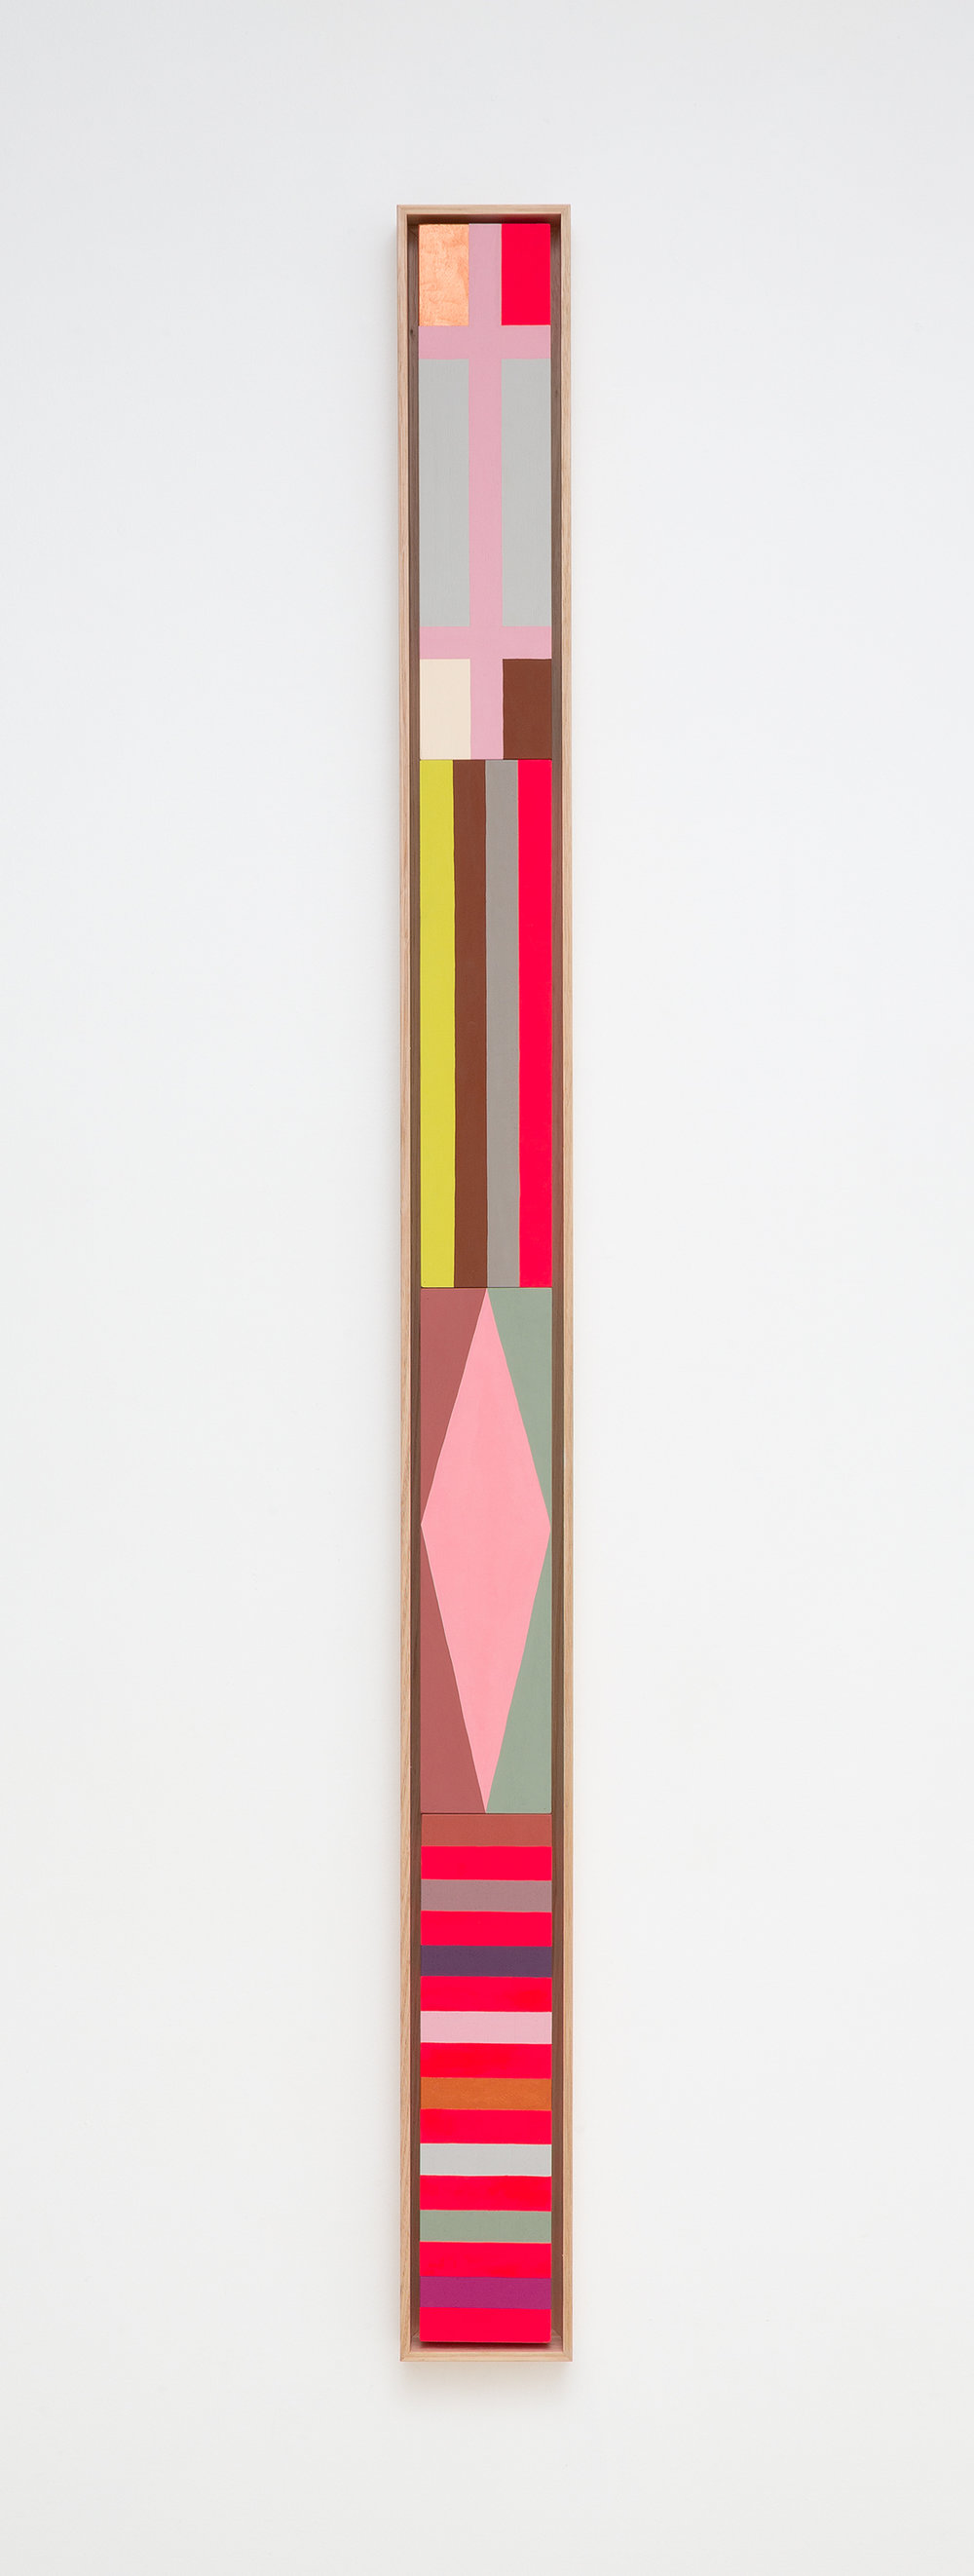 LOUISE TUCKWELL  Simultan  2018 acrylic on board 163 x 13cm